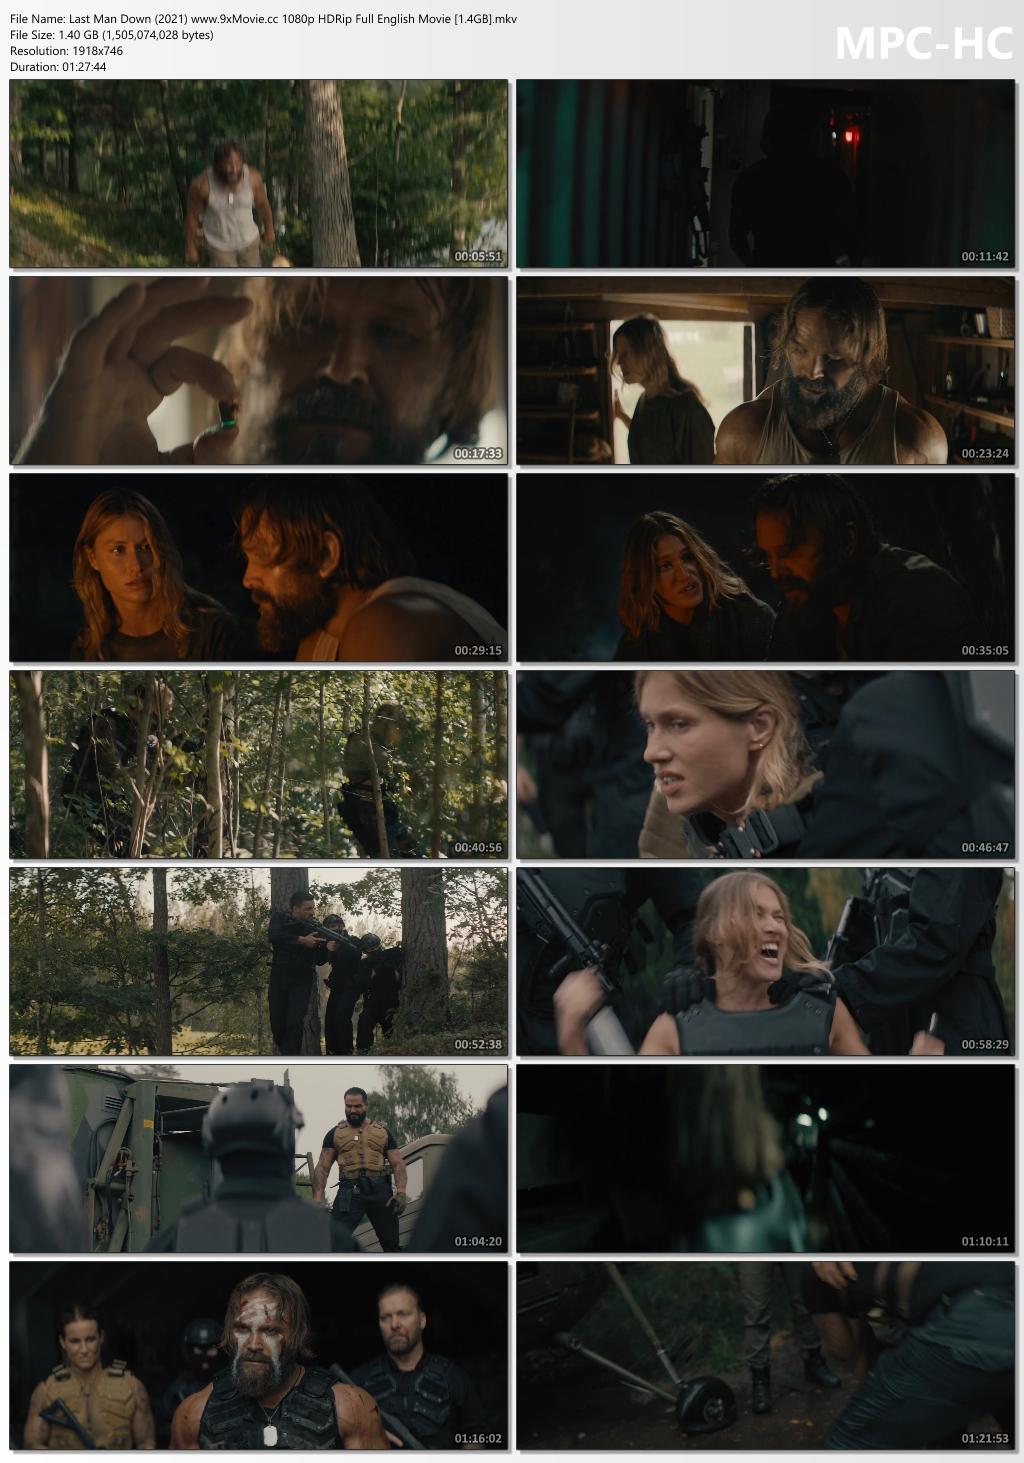 Last-Man-Down-2021-www-9x-Movie-cc-1080p-HDRip-Full-English-Movie-1-4-GB-mkv